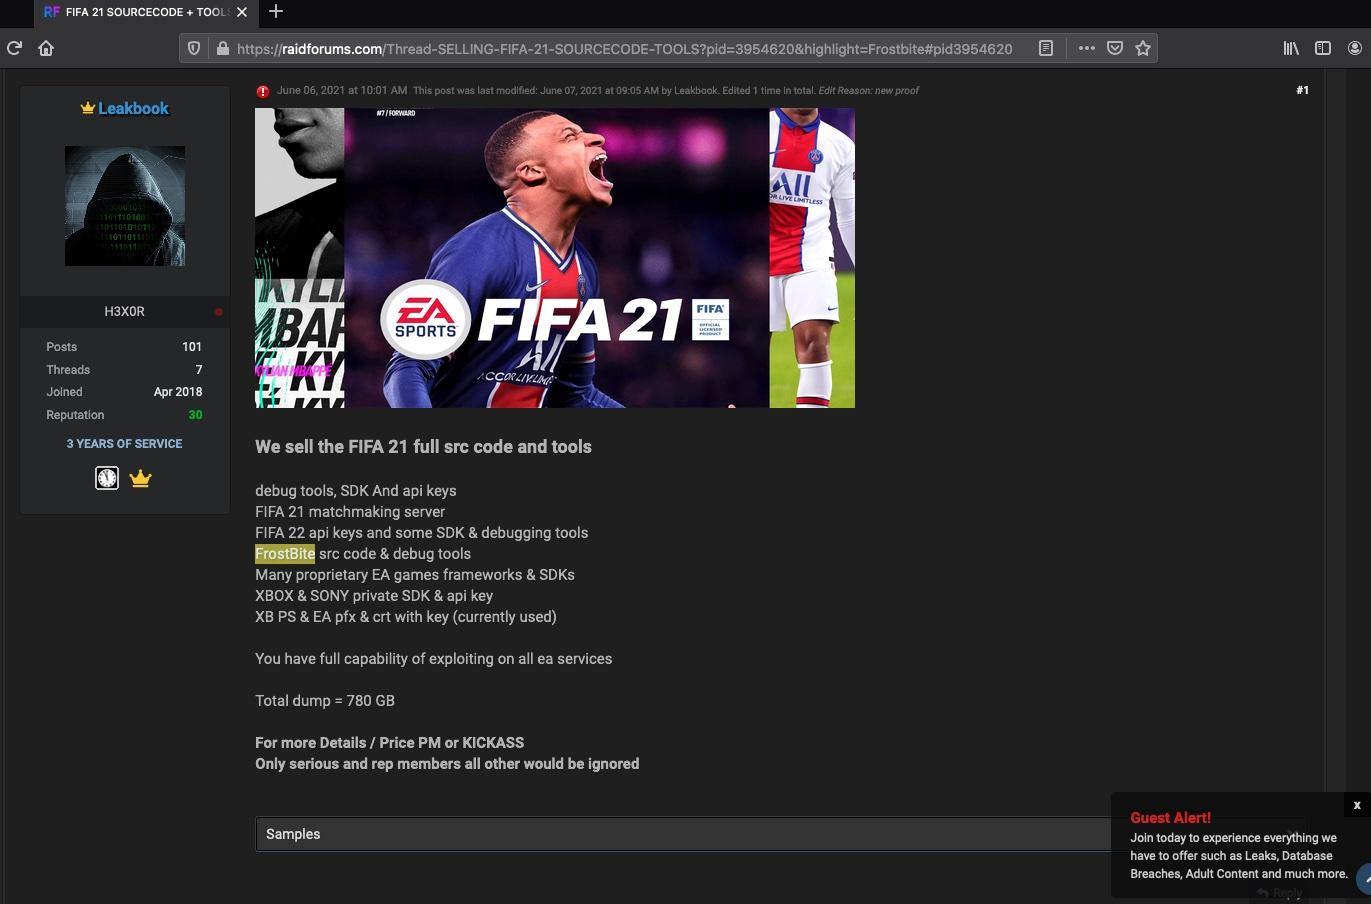 Electronic Arts hacked